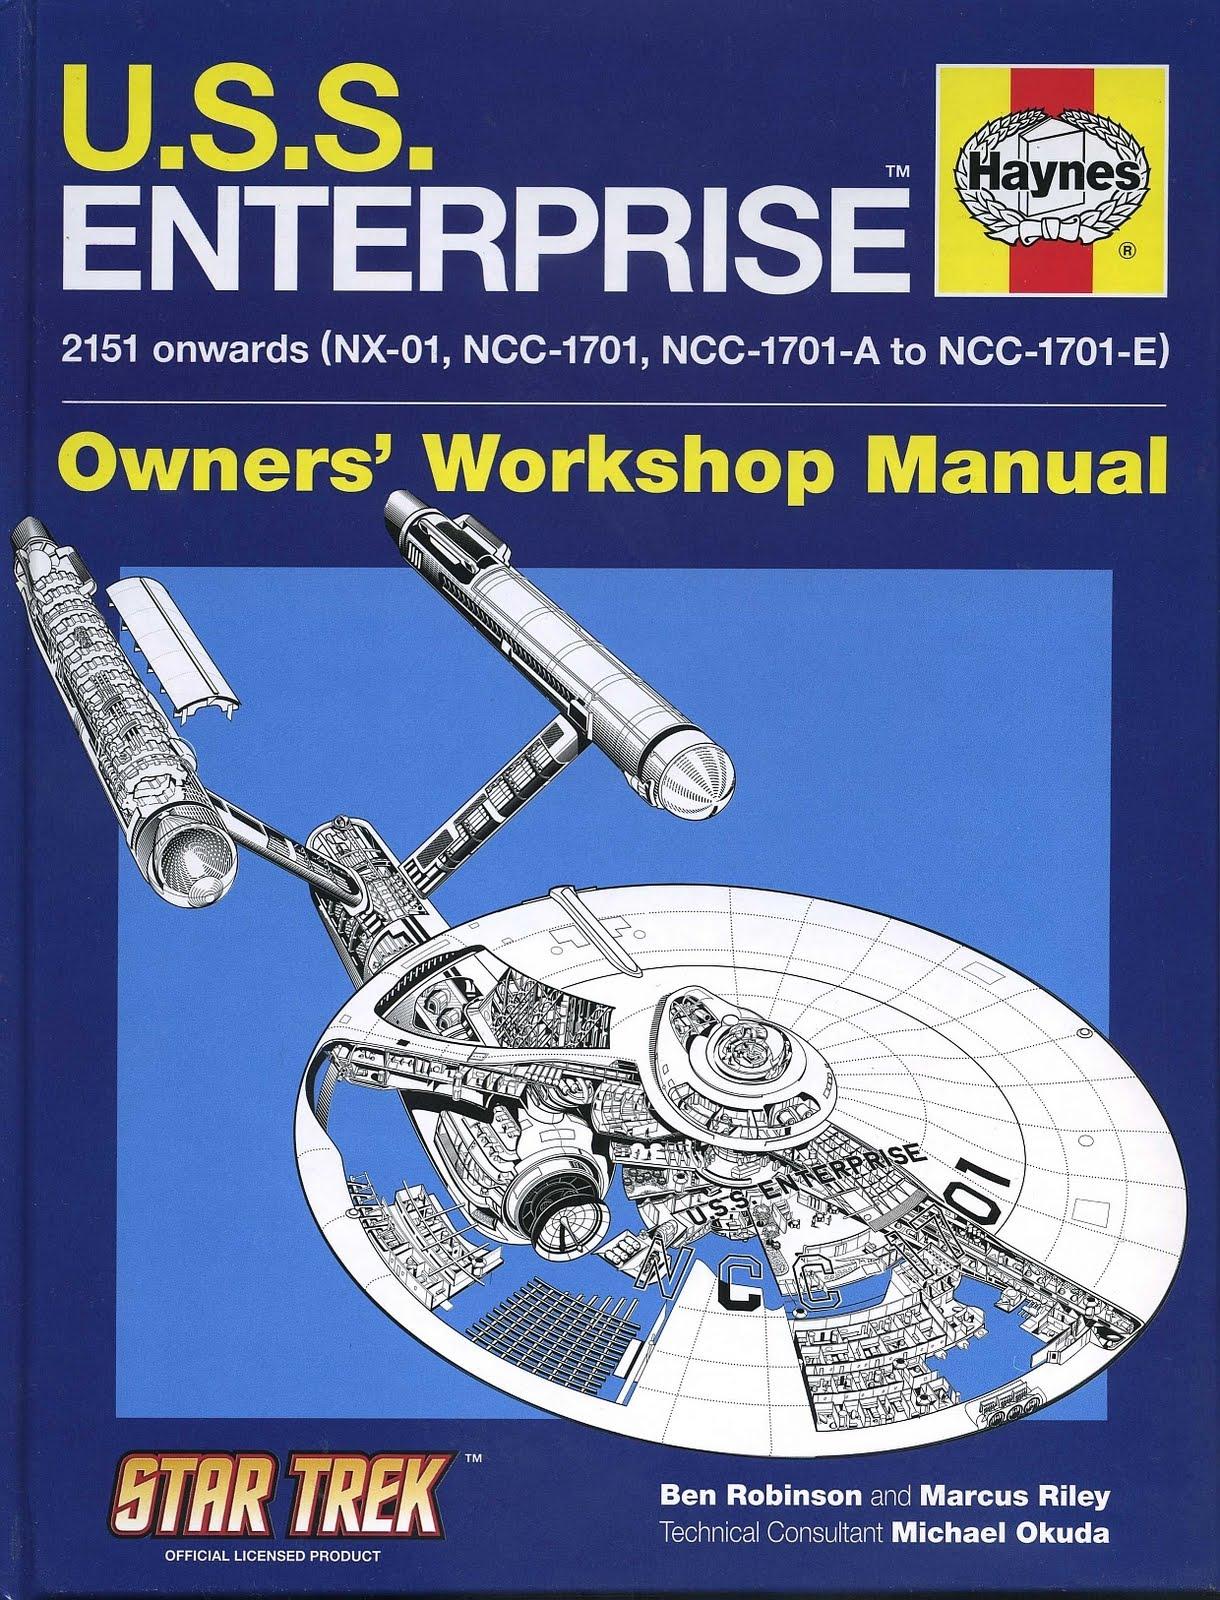 transpress nz uss enterprise owners manual